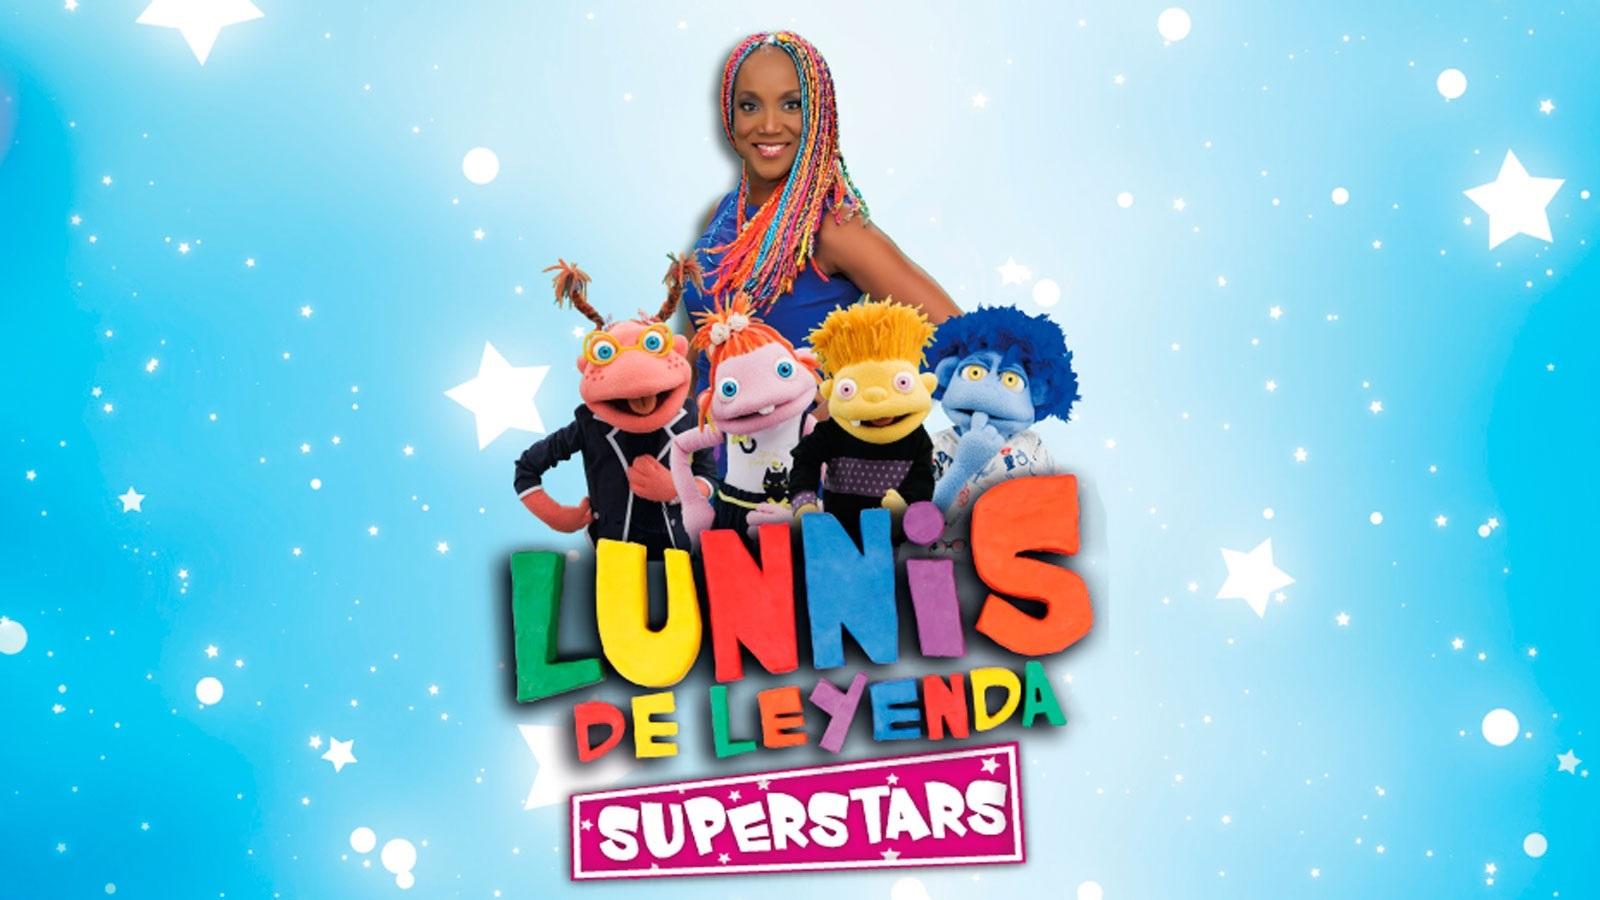 Lunnis de Leyenda Superstars en vivo